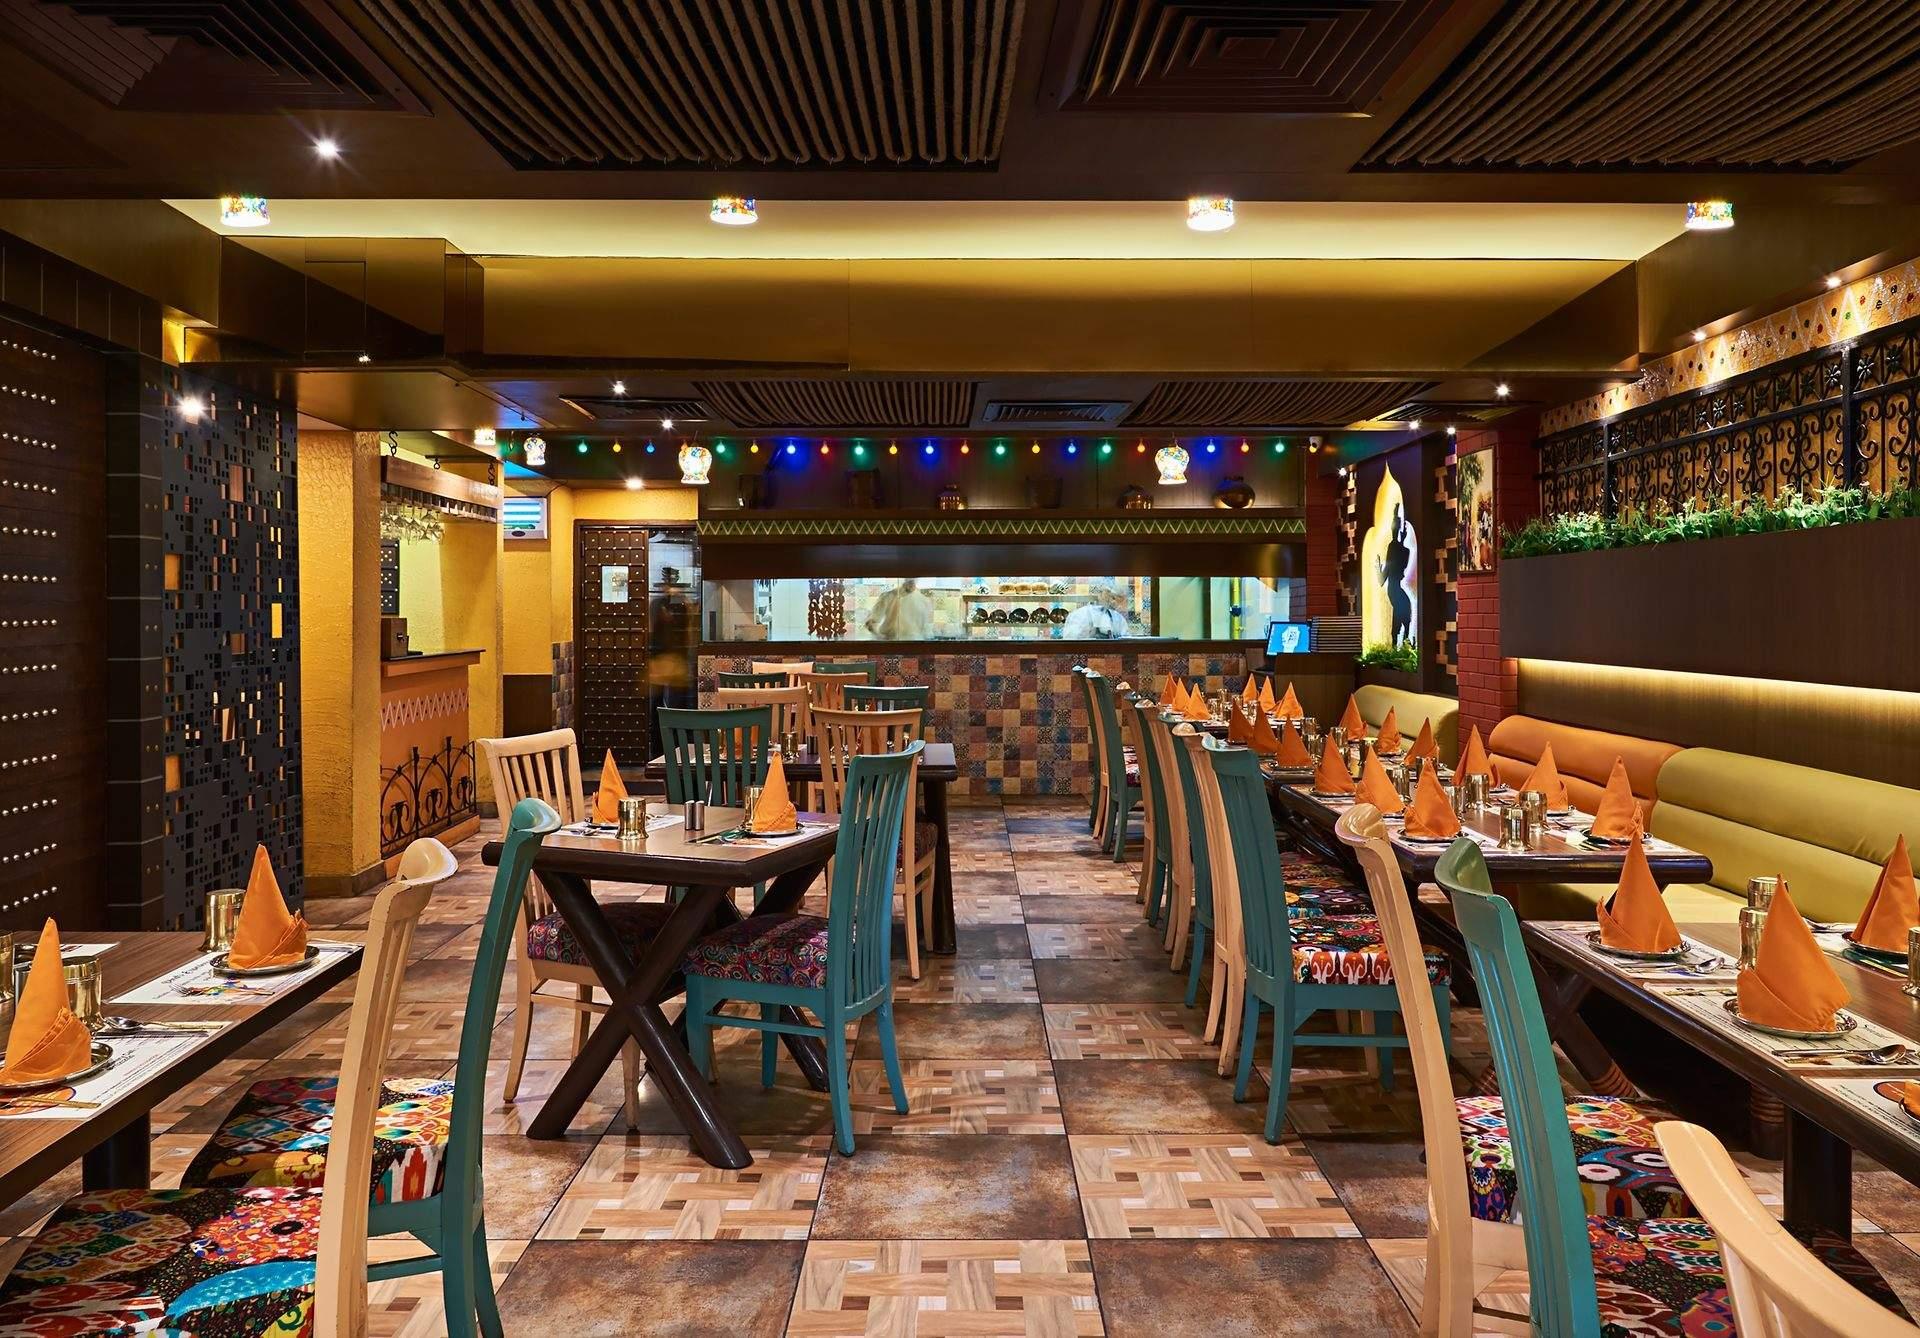 Home Delivery Restaurants in Khyala-Vishnu Garden, Delhi - Order ...